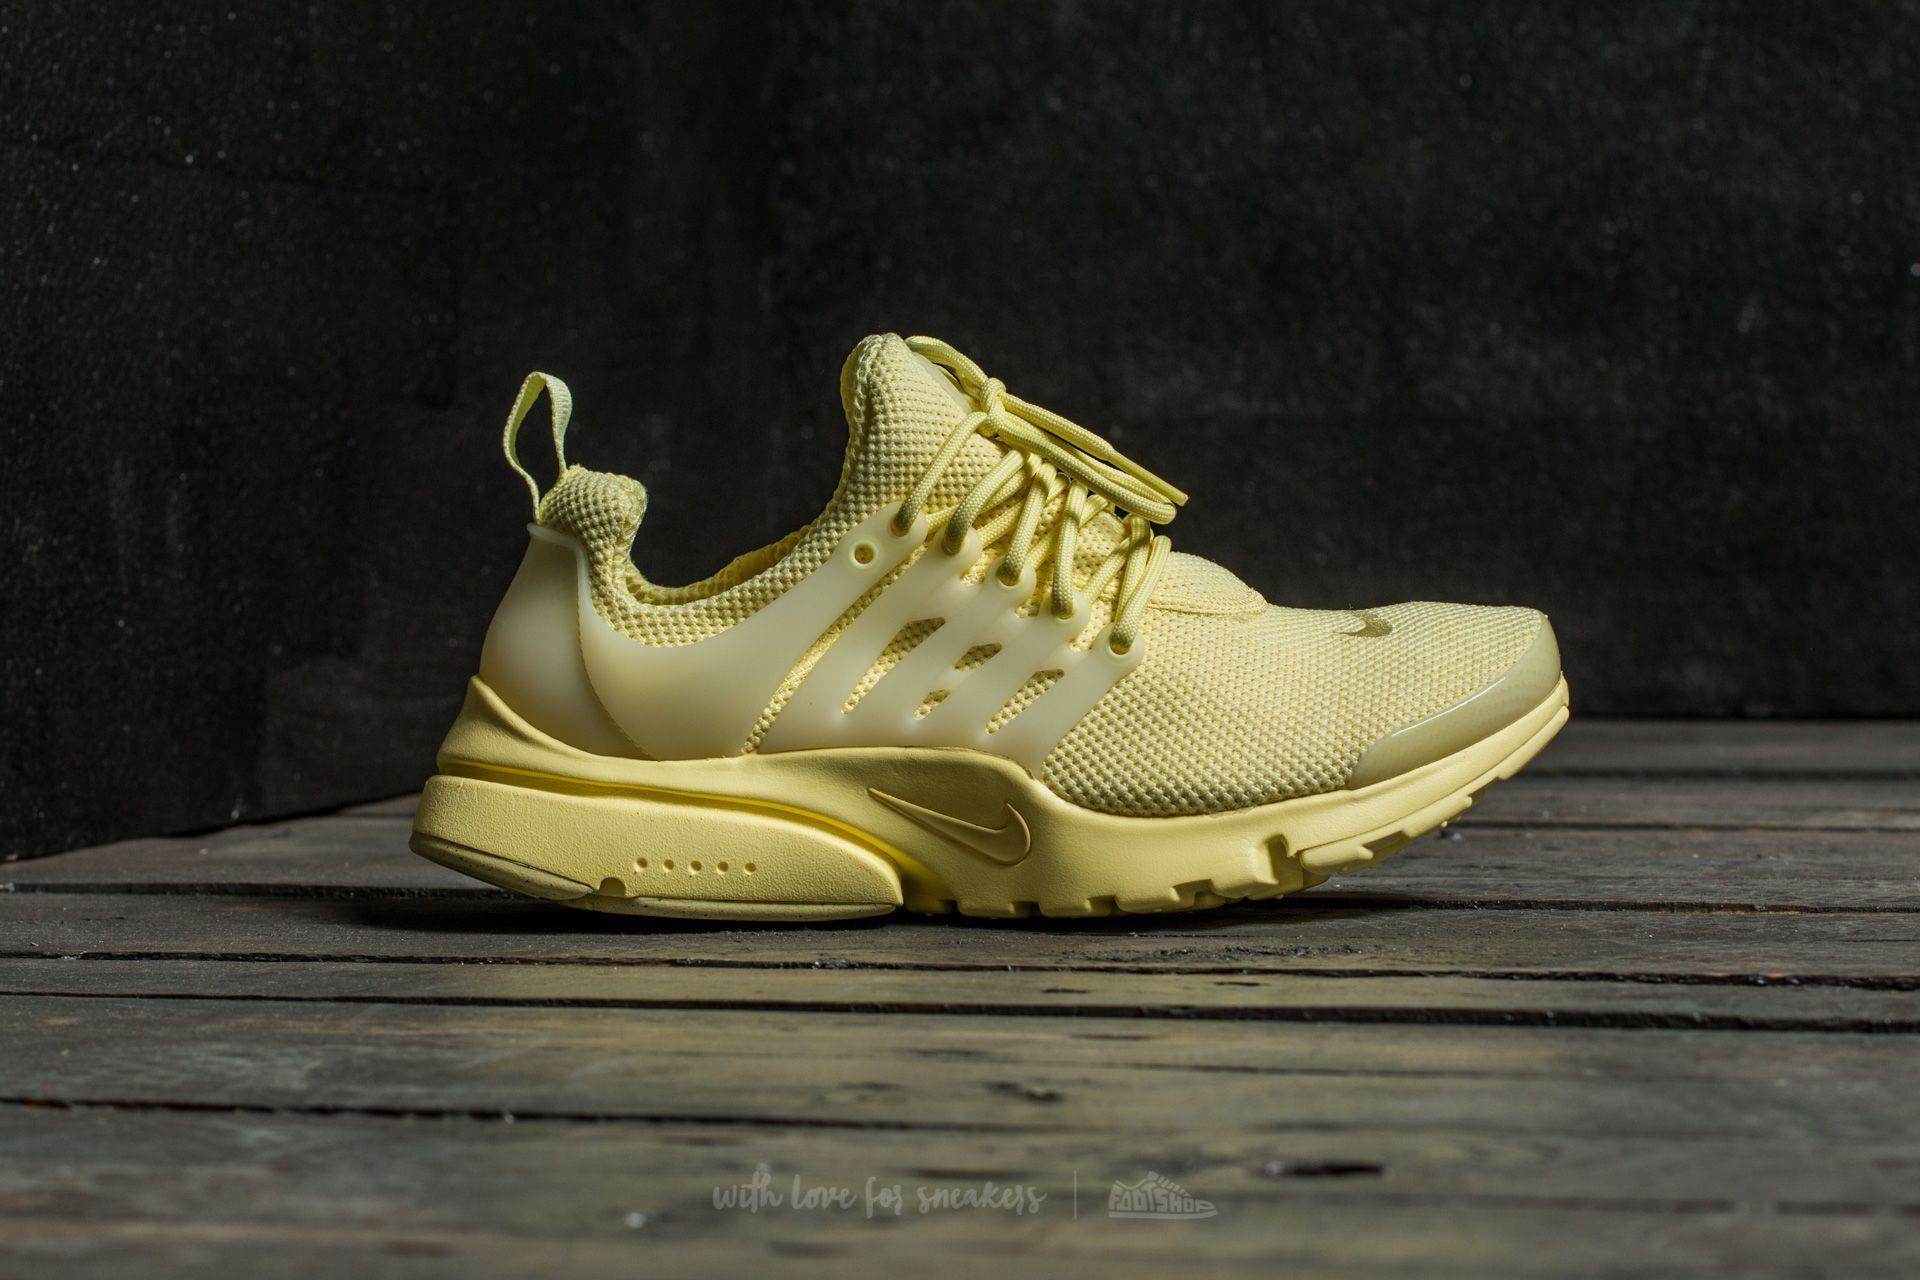 412eca312fc7 Lyst - Nike Air Presto Ultra Br Lemon Chiffon  Lemon Chiffon for Men